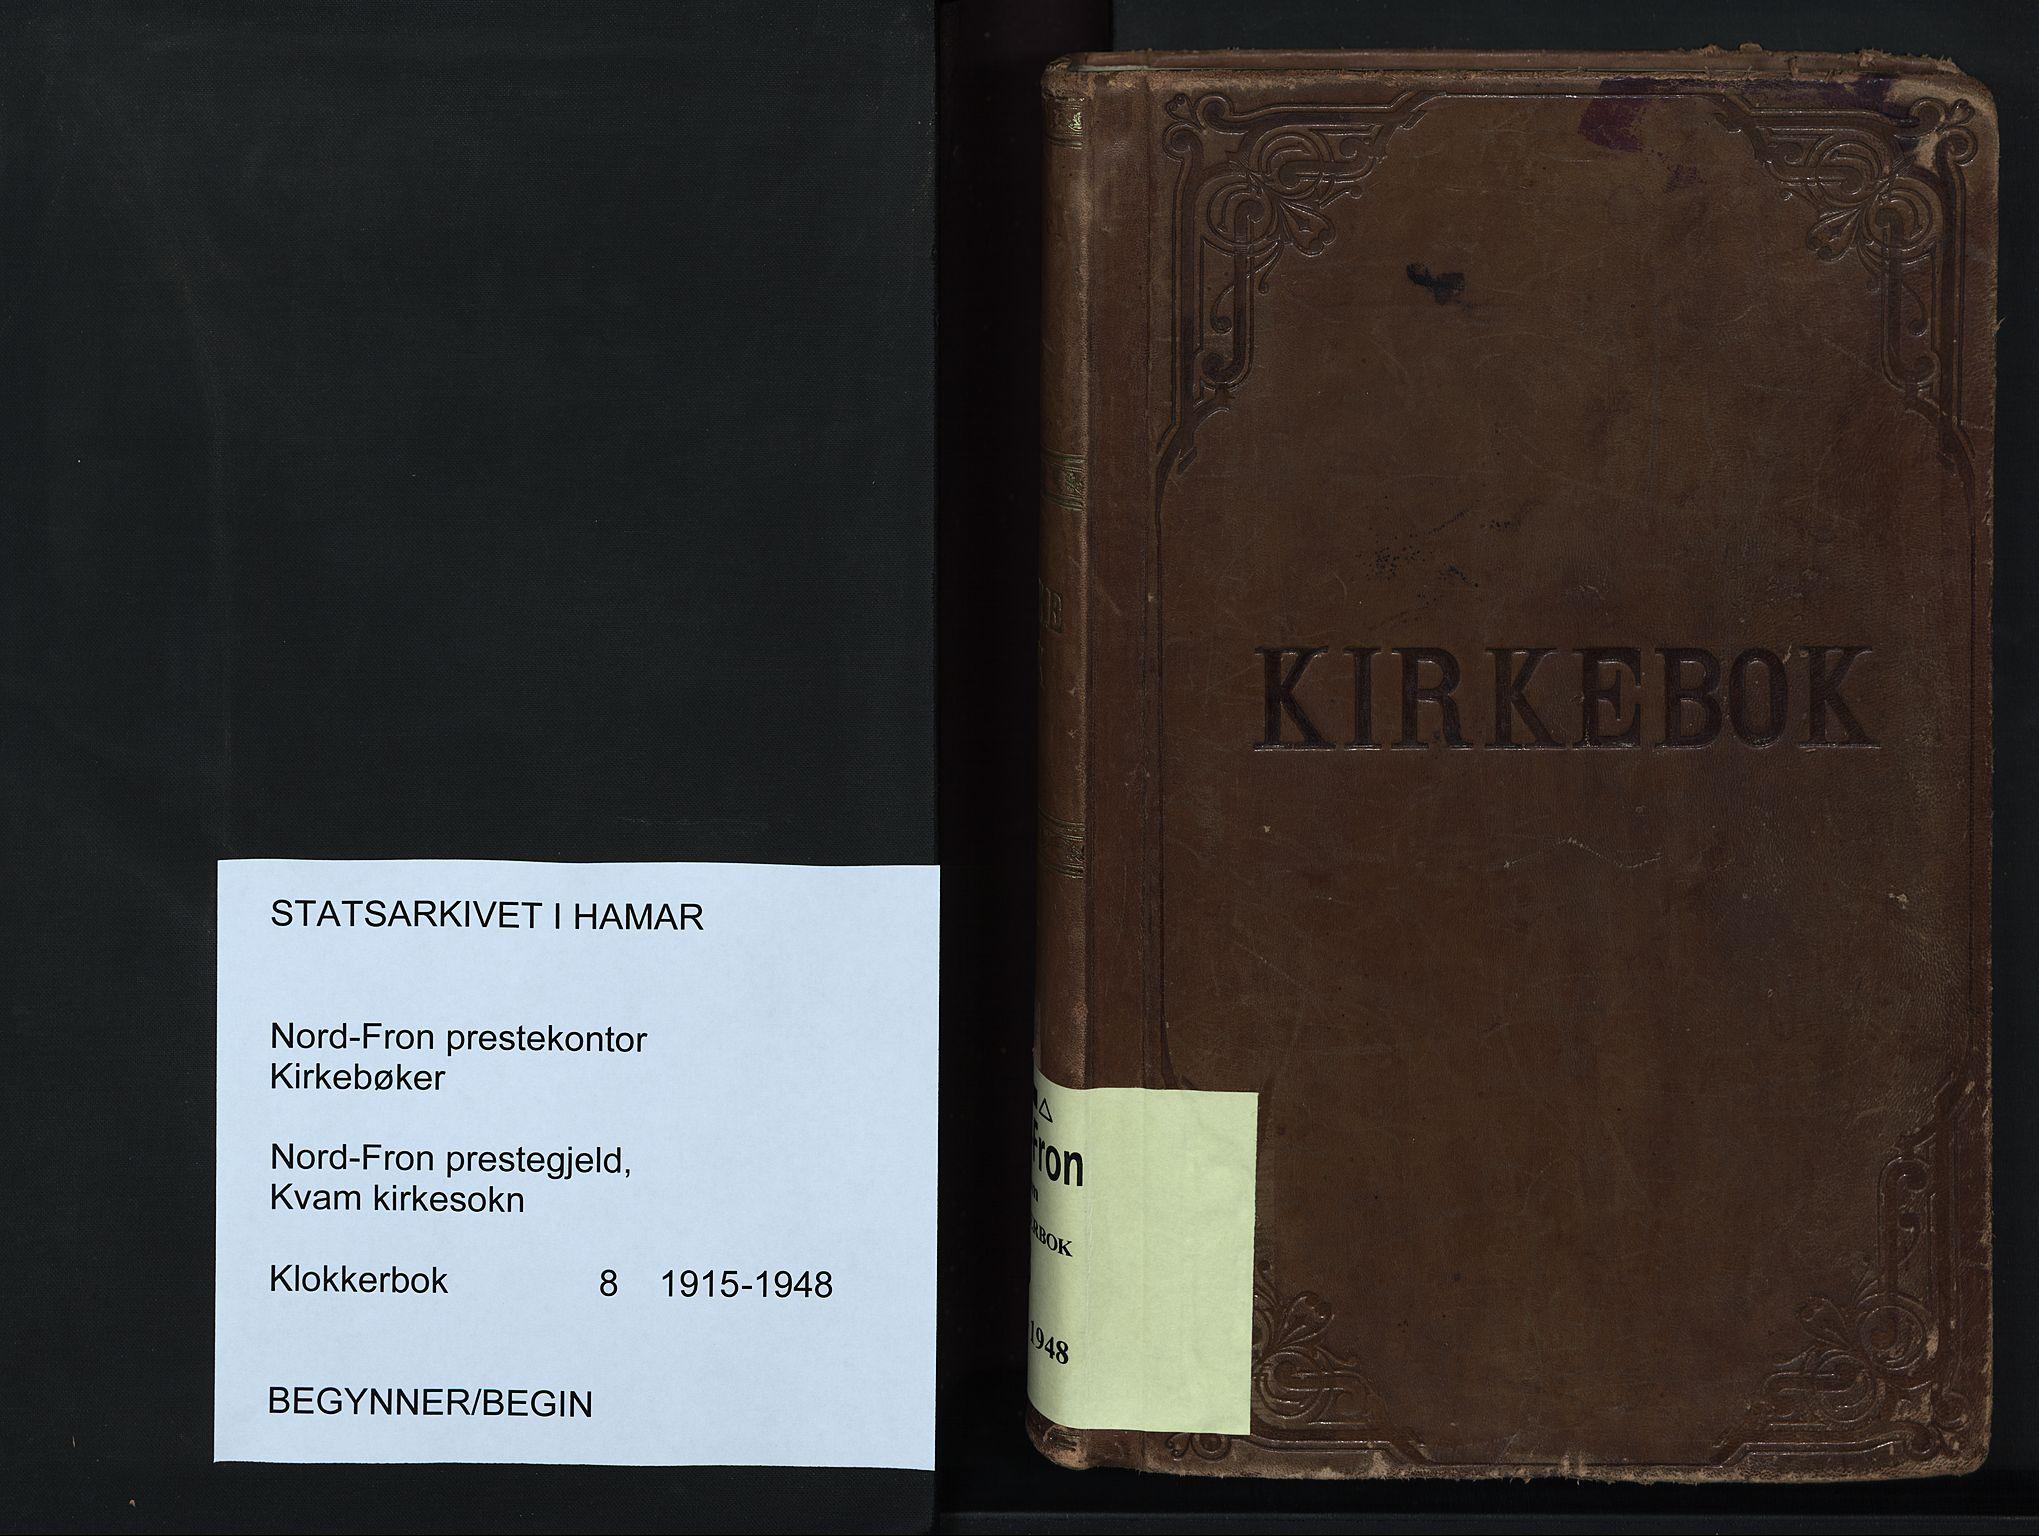 SAH, Nord-Fron prestekontor, Klokkerbok nr. 8, 1915-1948